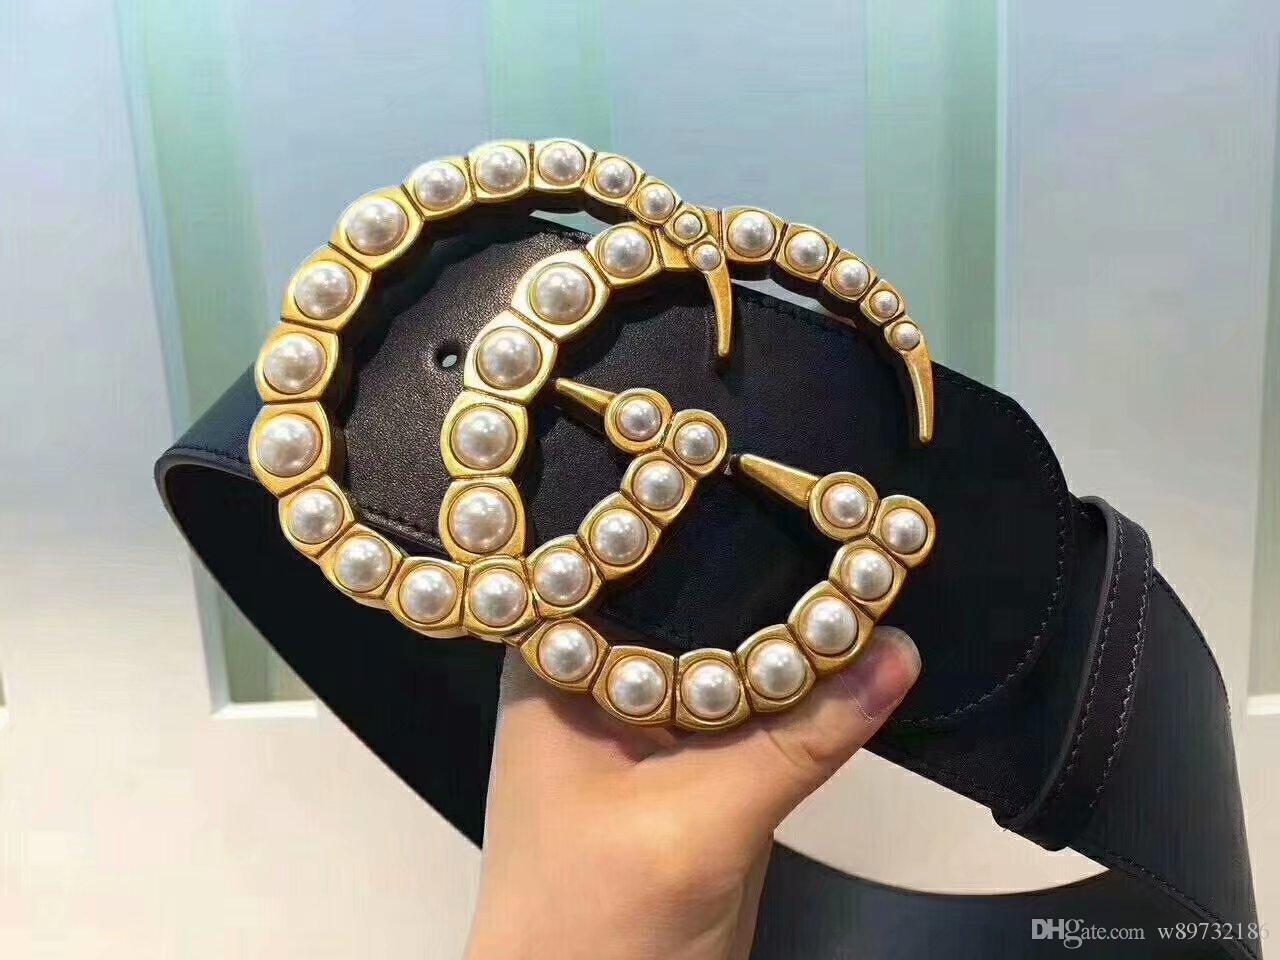 200cm Brand New Designer Canvas Belts for Men Women Hip Hop Belt Street Casual Loose Waist Strap High Quality Off Belt Wh